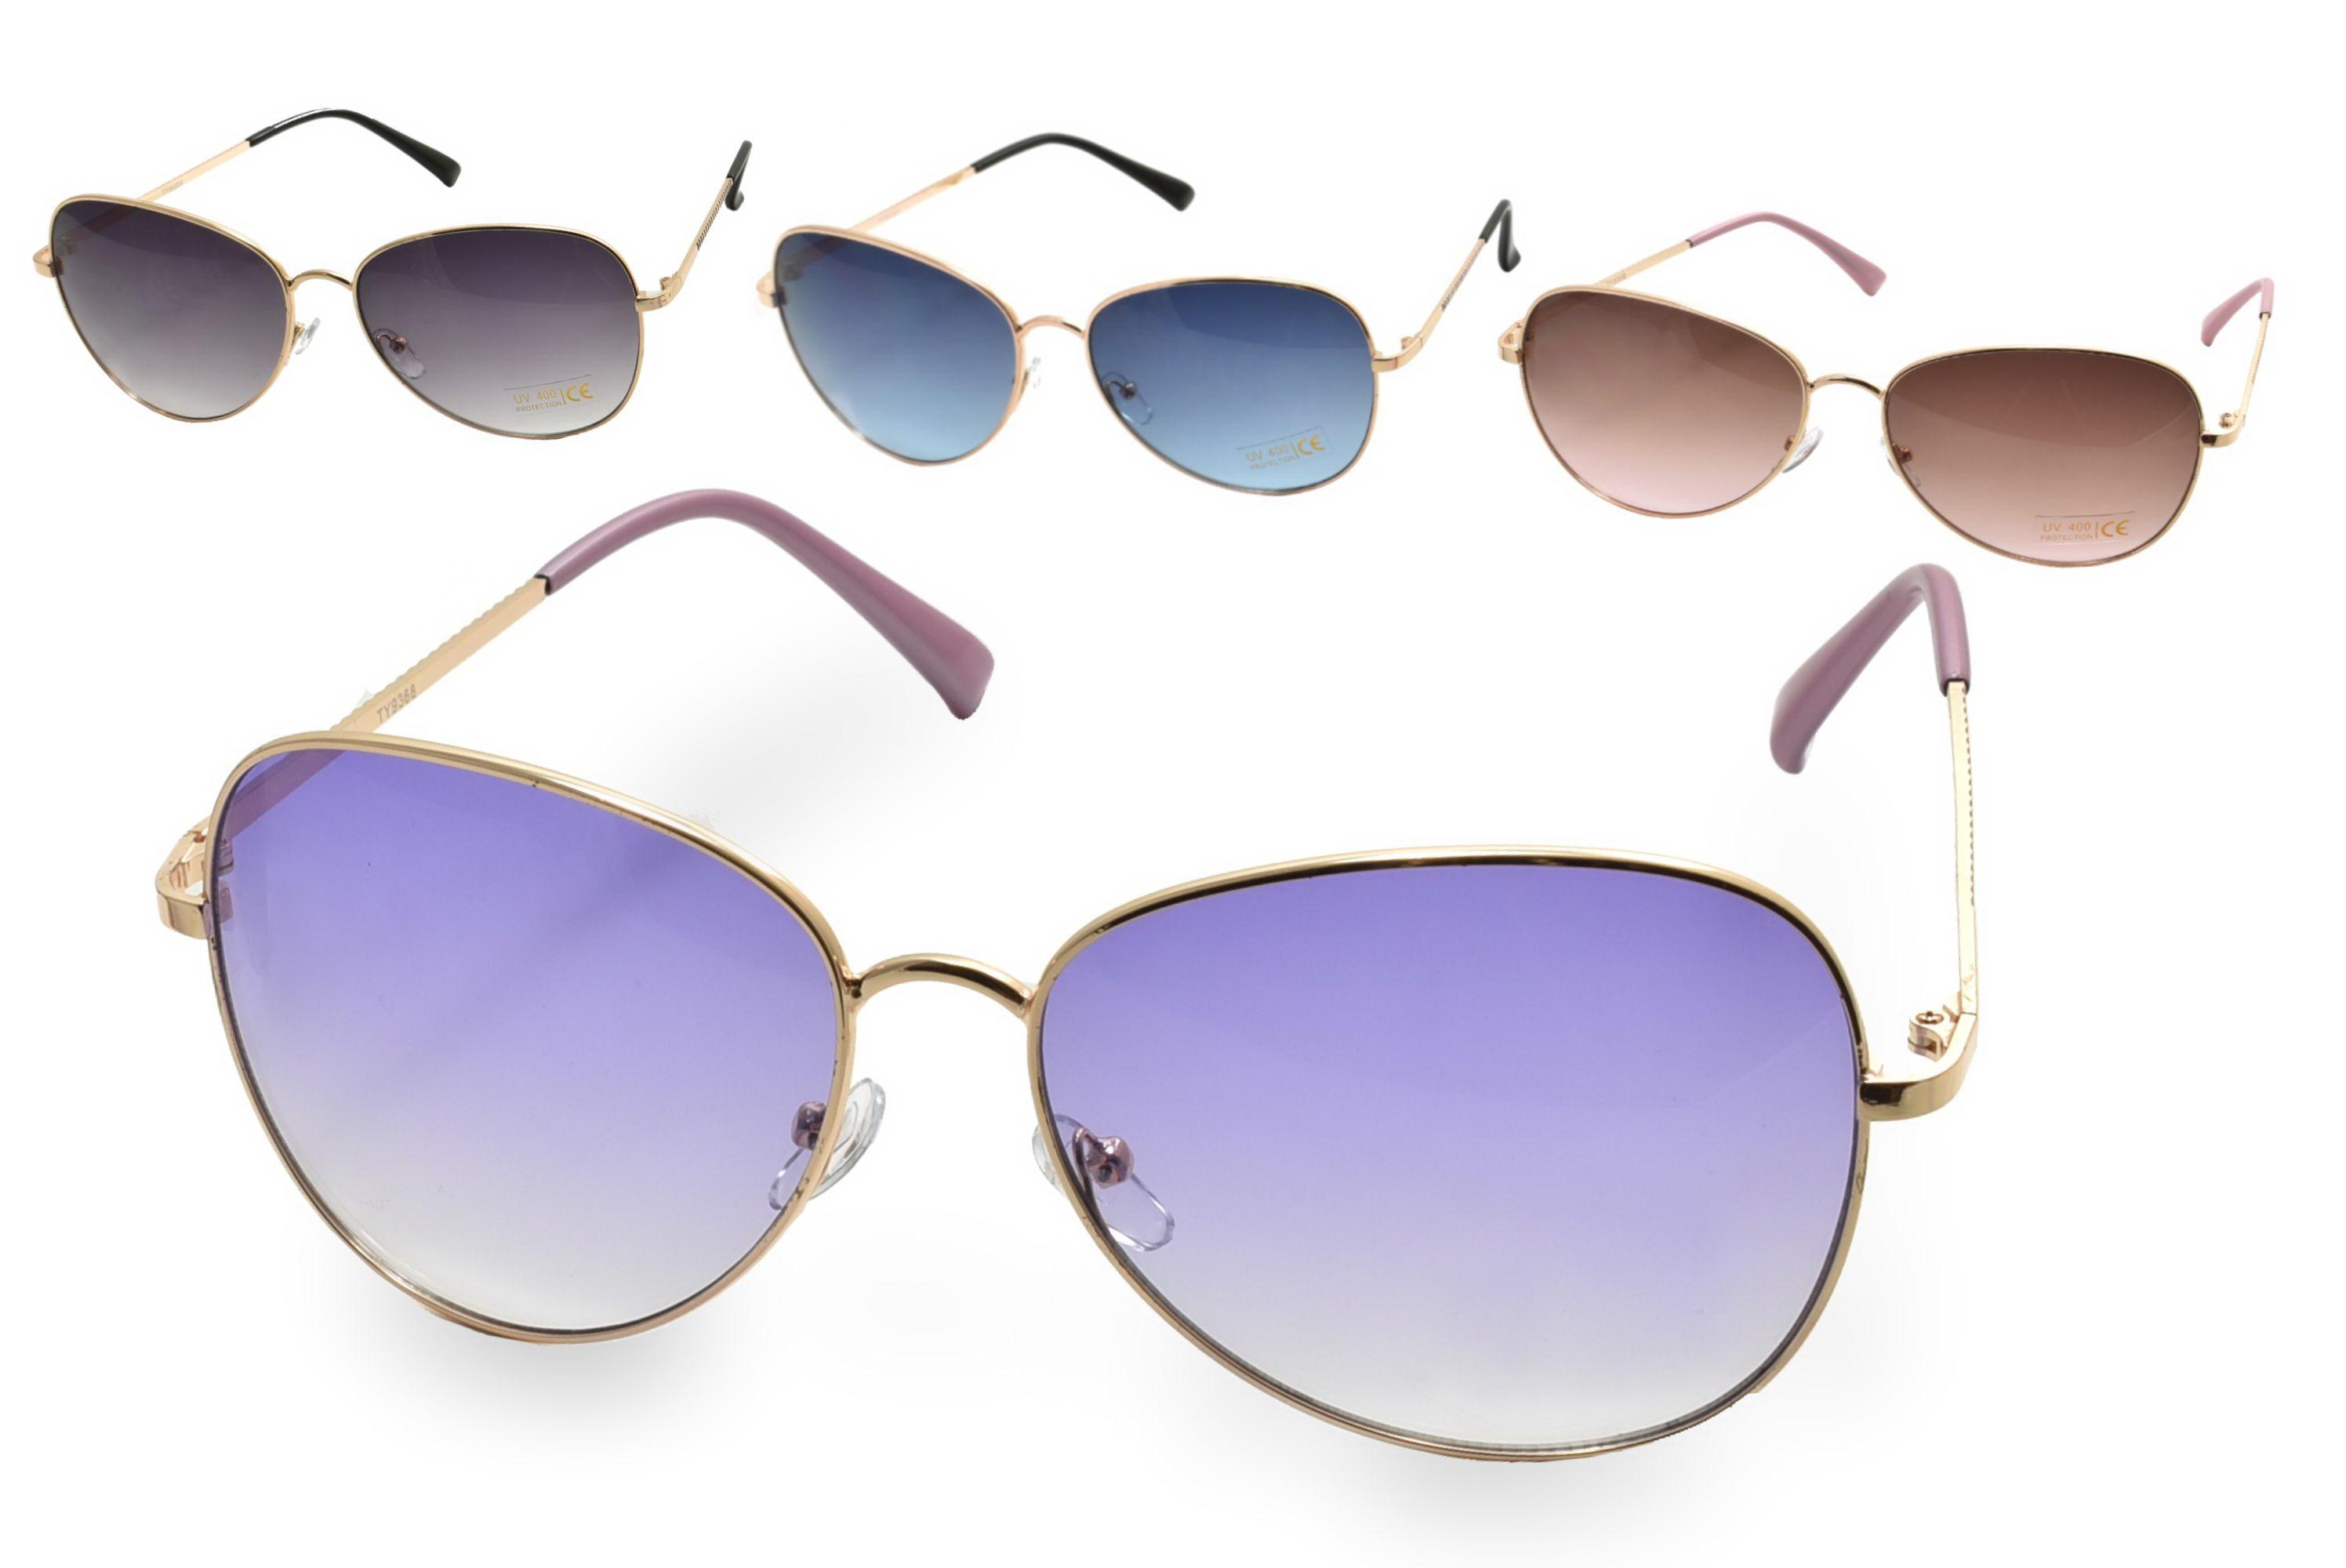 Ladies Metal Frame Sunglasses - 4 Assorted